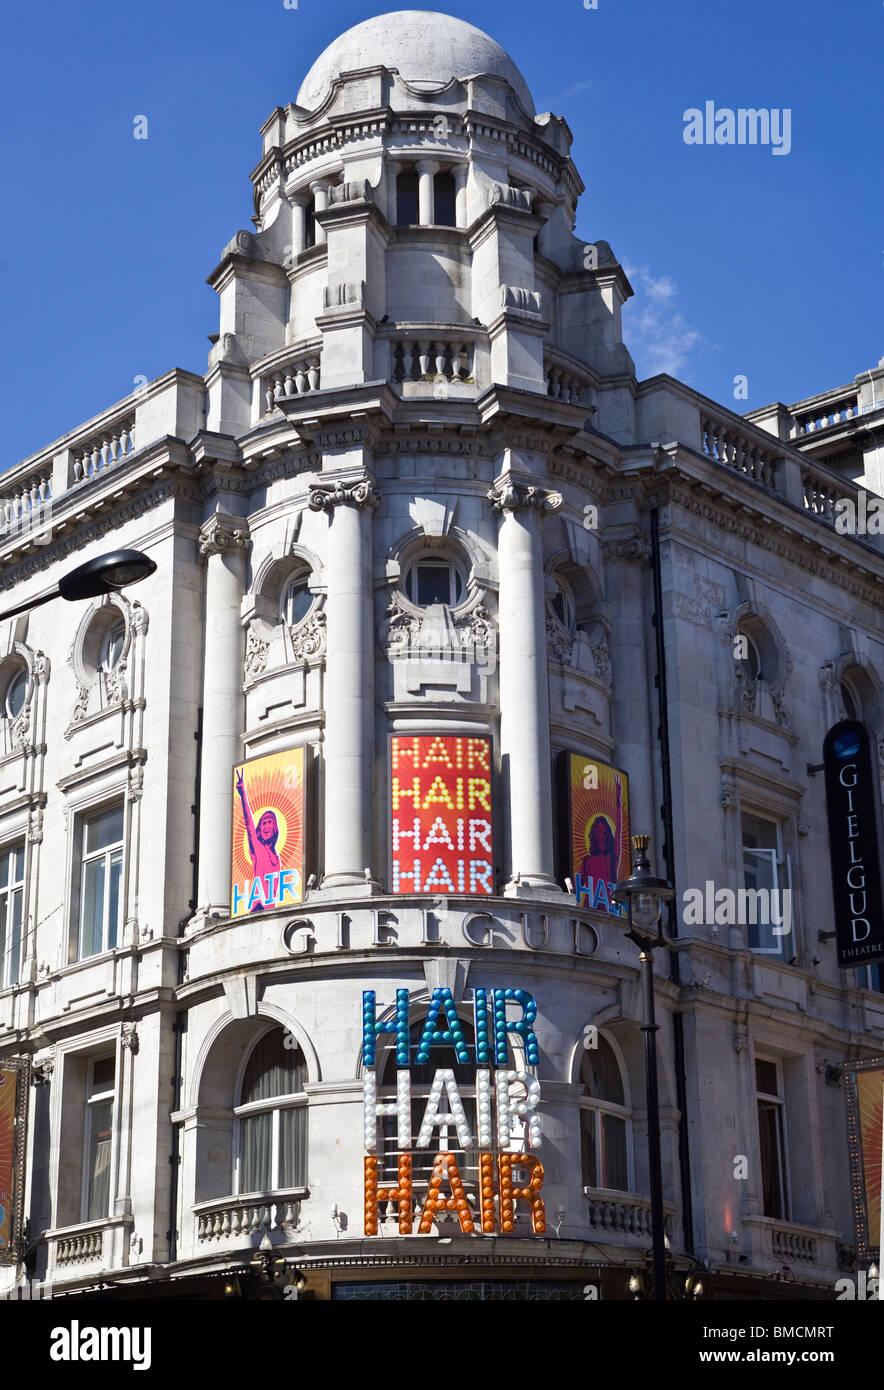 Hair Show The Gielgud Theatre Shaftesbury Avenue London UK - Stock Image